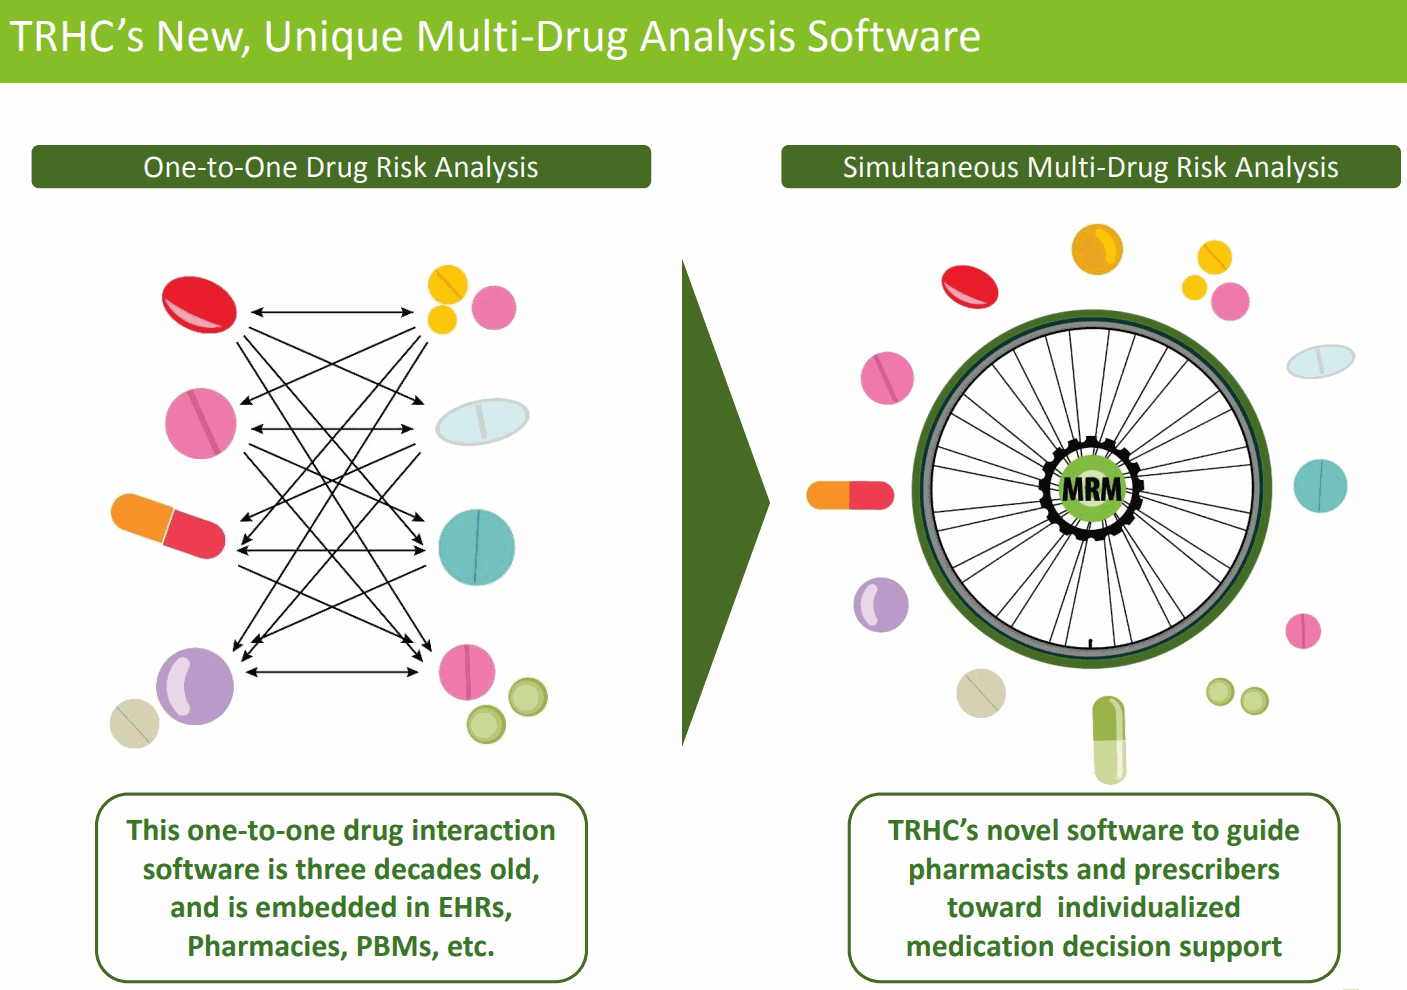 TRHC Simultaneous Multi-Drug Risk Analysis